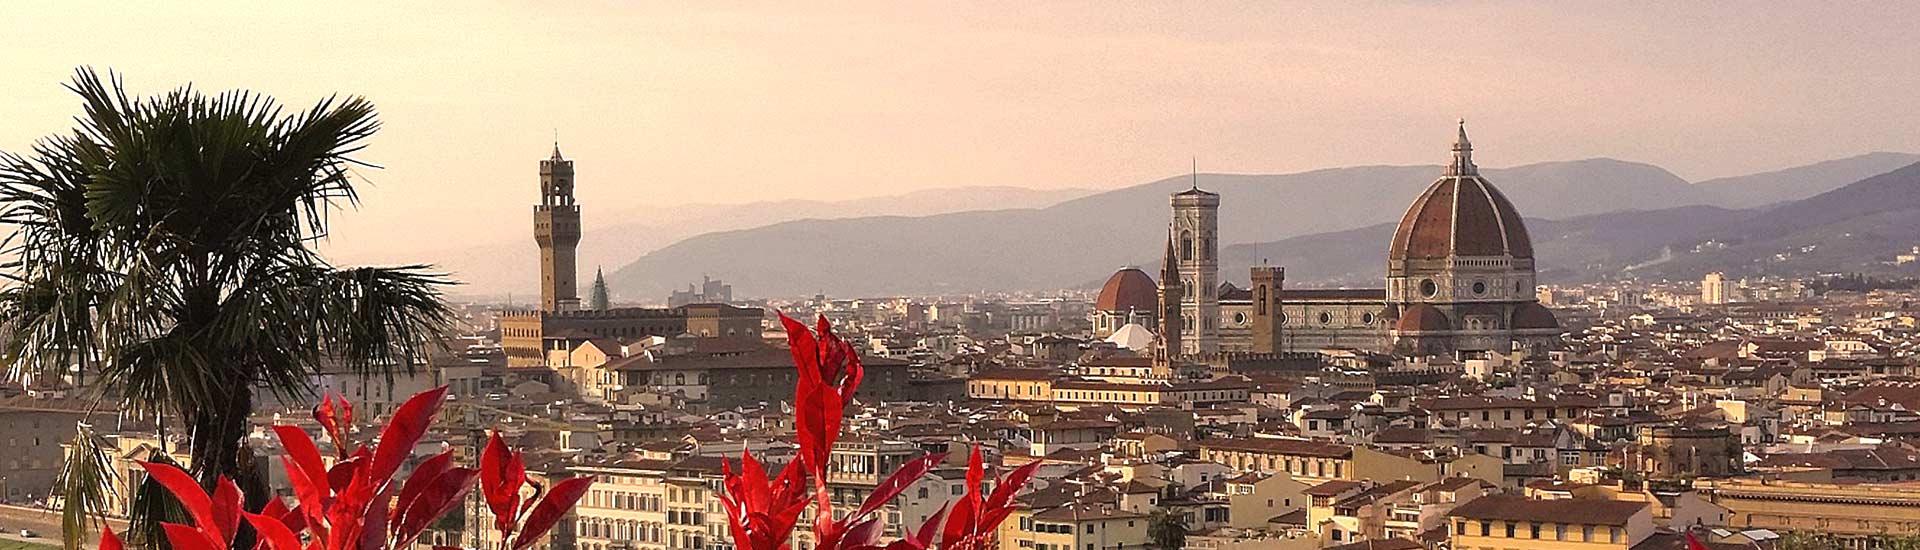 Firenze fotografata da Andrea Parlascino